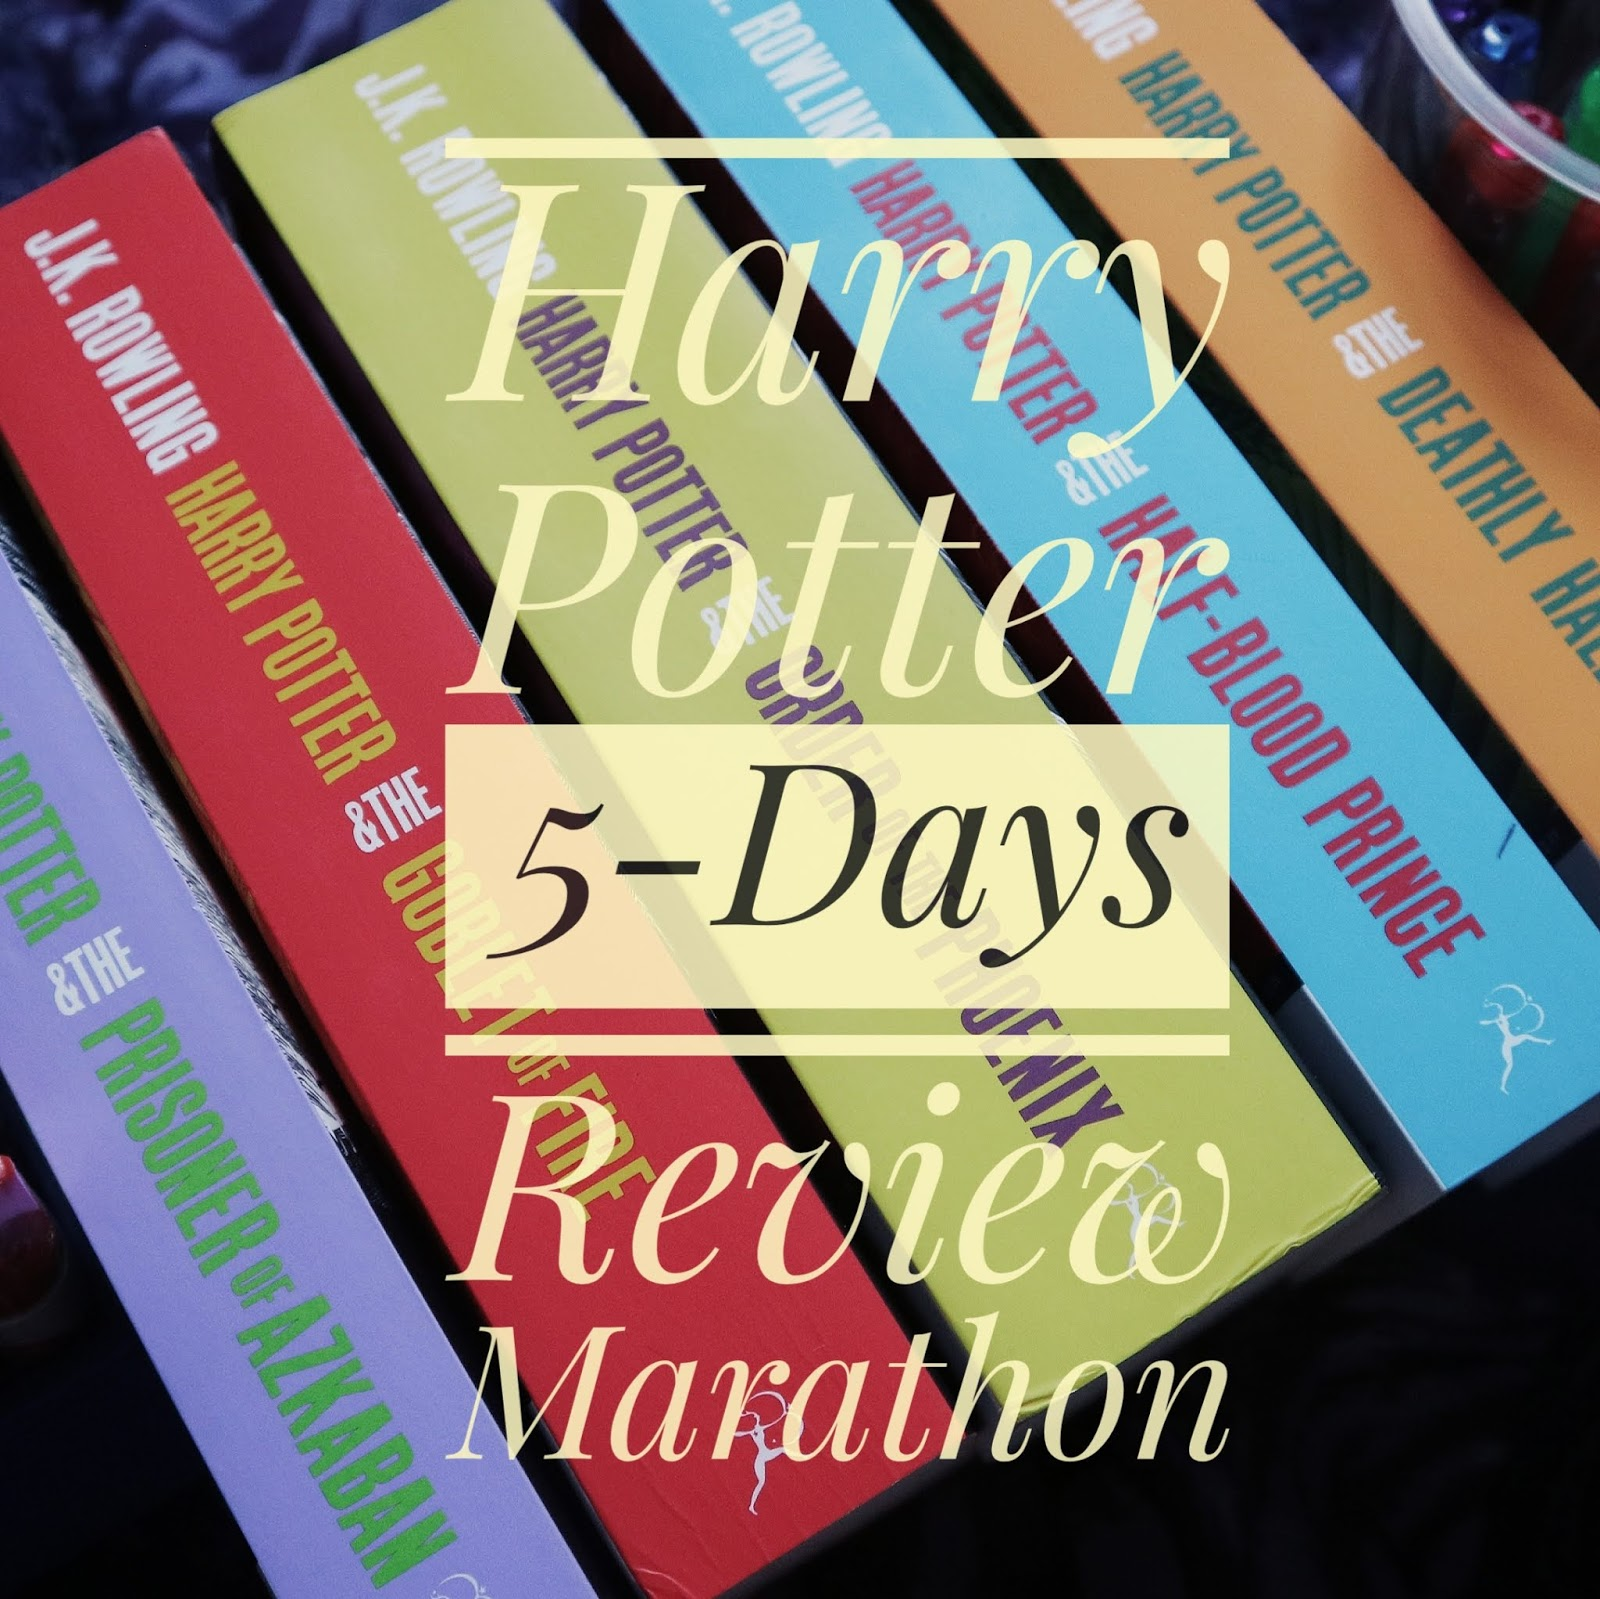 Tentang Harry Potter 5 Days Review Marathon 27 31 Juli 2019 Far S Books Space